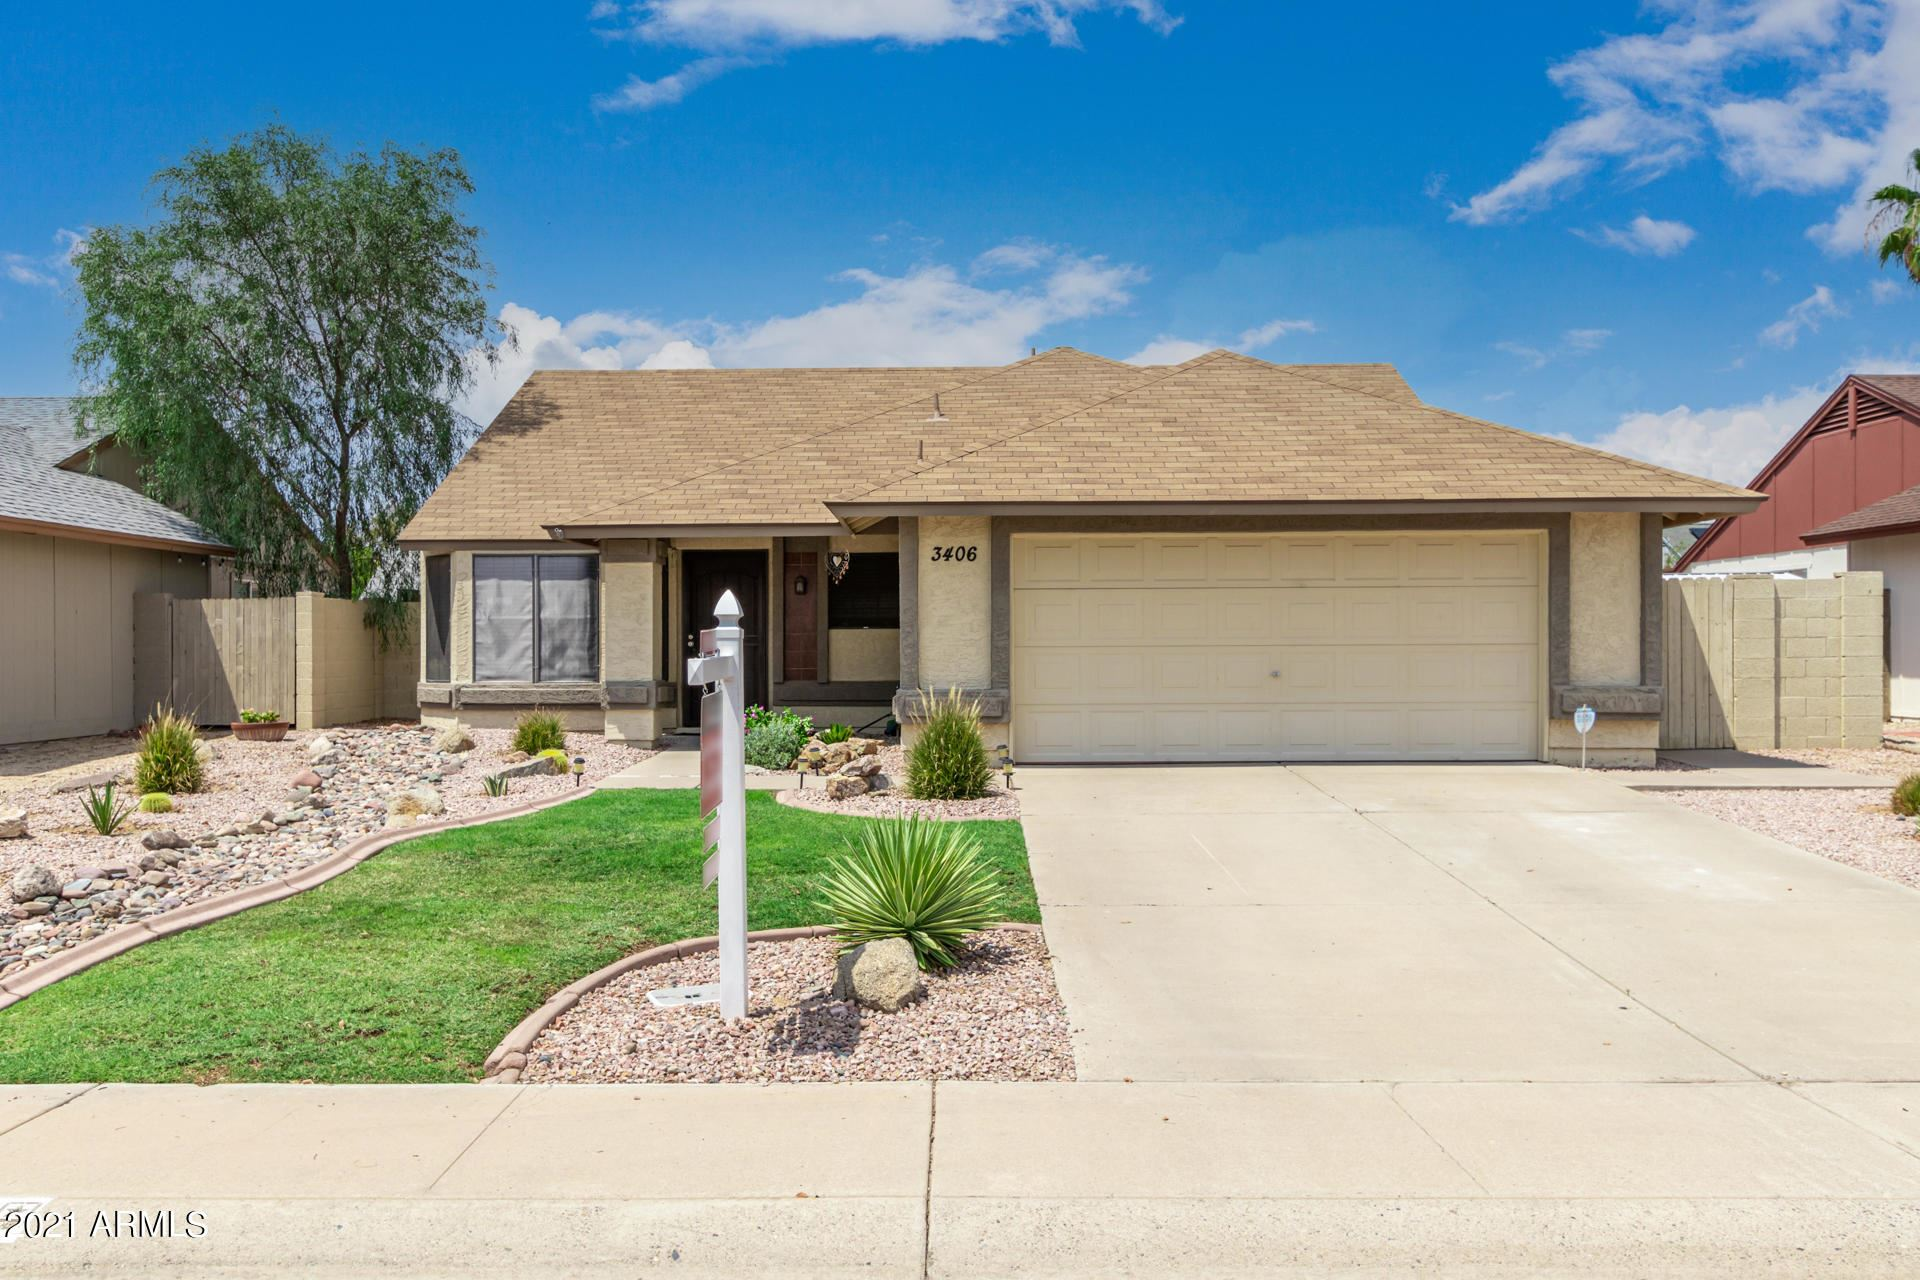 3406 W POTTER Drive, Phoenix, AZ 85027 - MLS#: 6266473